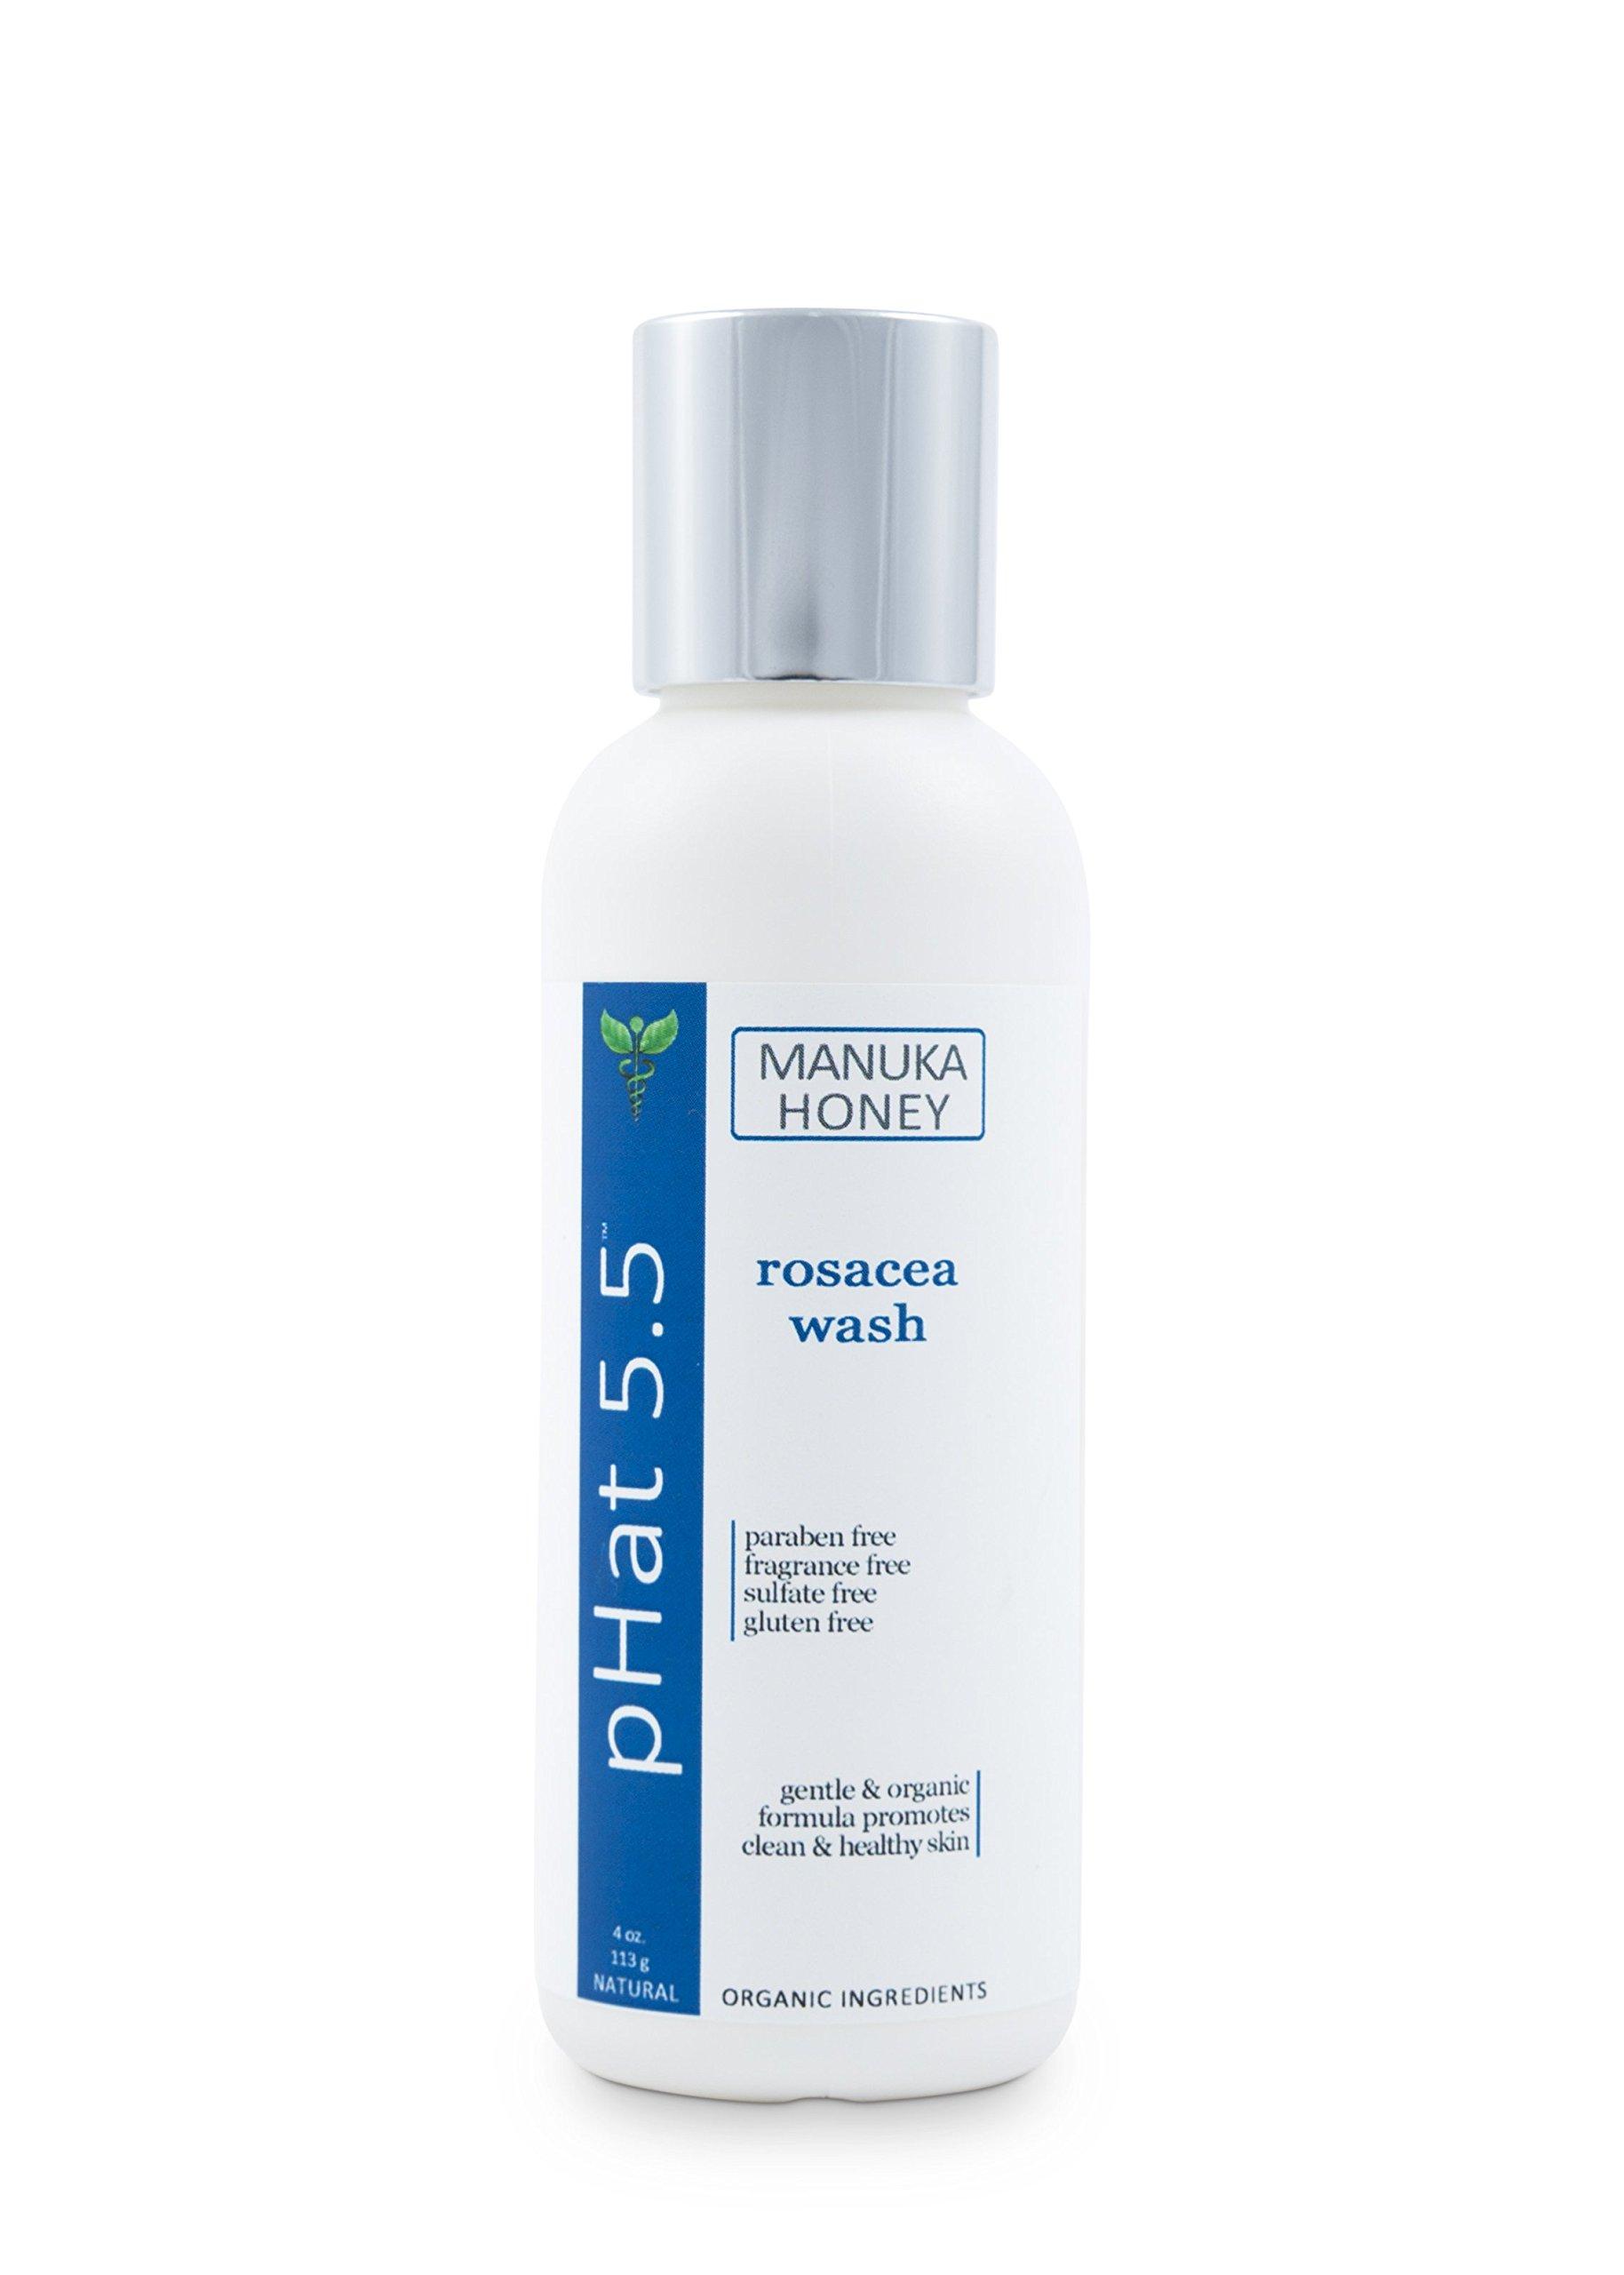 Moisturizing Rosacea Face & Body Wash for Sensitive Skin With Coconut Oil, Manuka Honey and